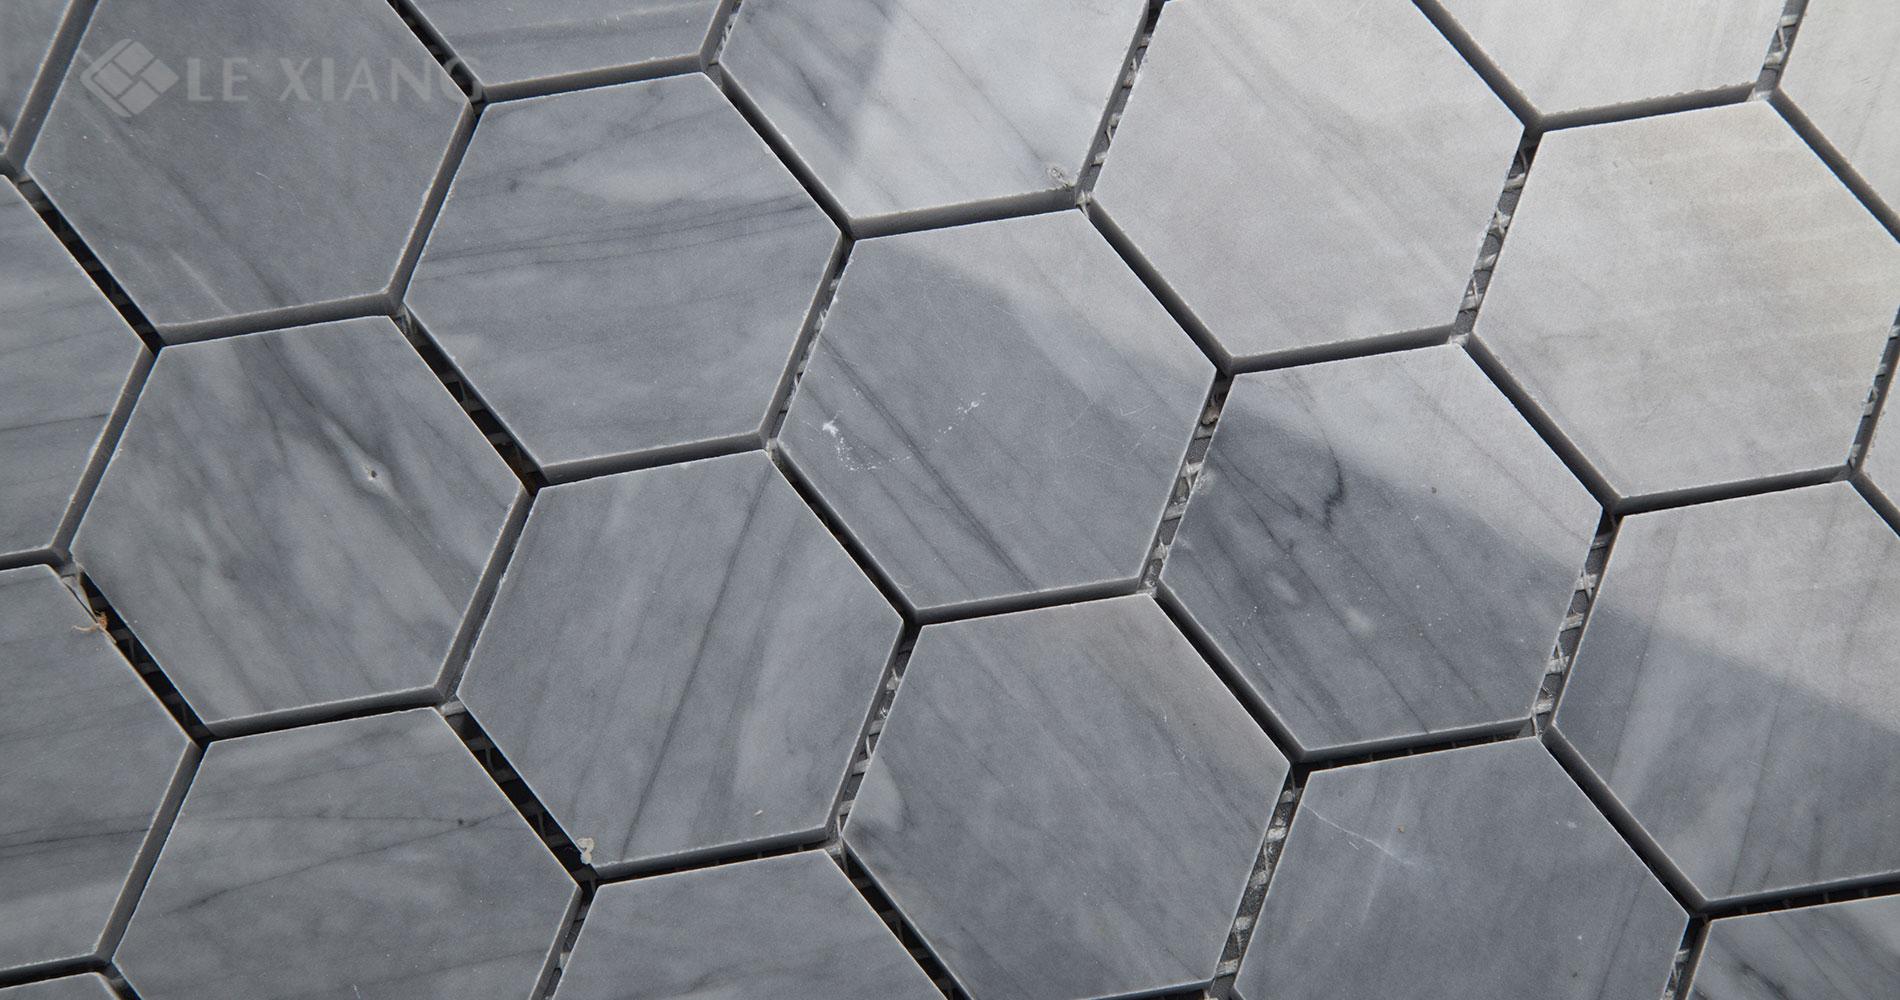 Blue-Hexagon-Stone-Mosaics-Tiles-Bathroom-Floors-4